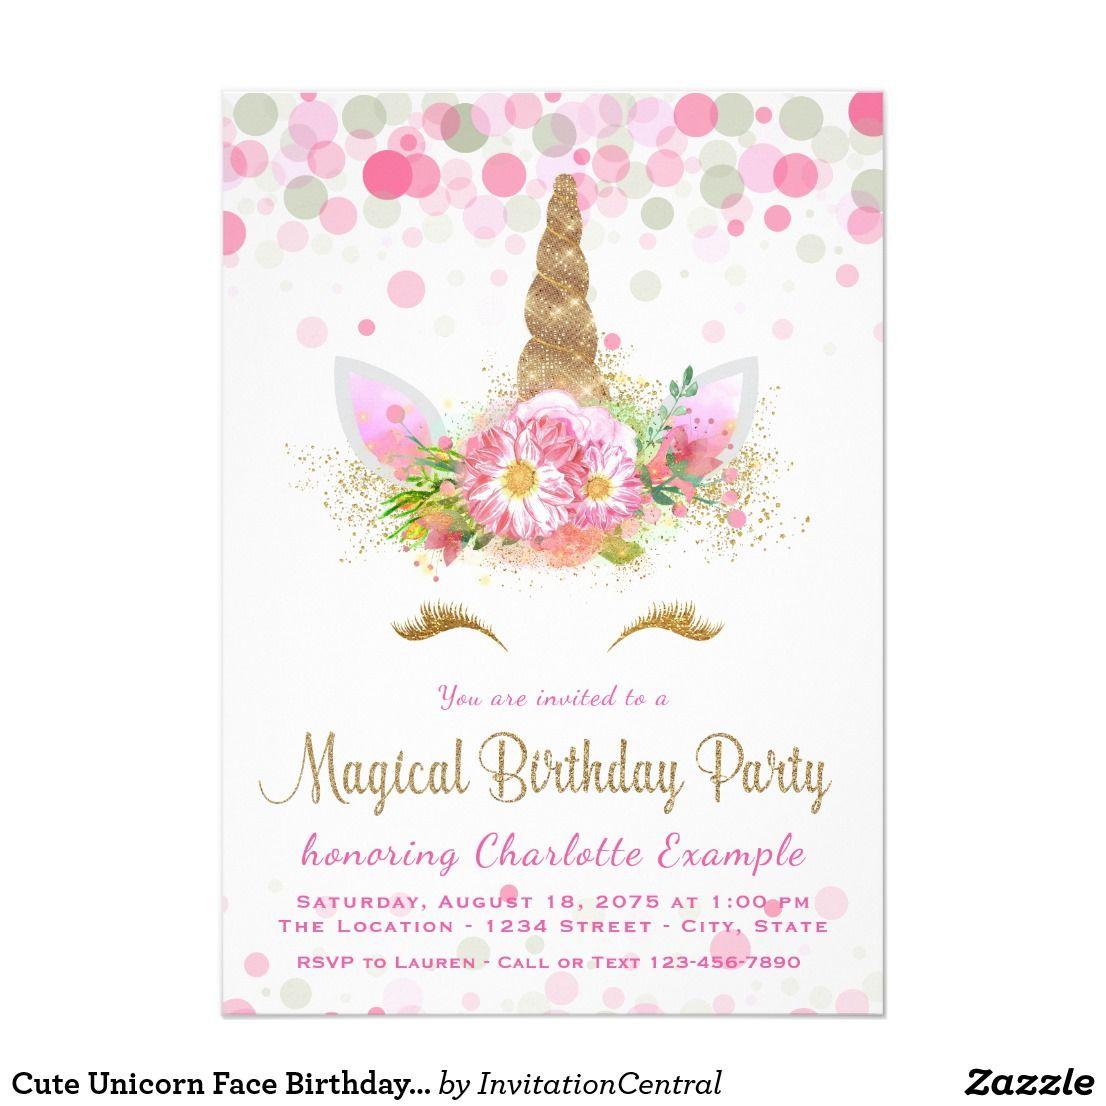 Cute Unicorn Face Birthday Party Invitations | Kids Birthday Party ...